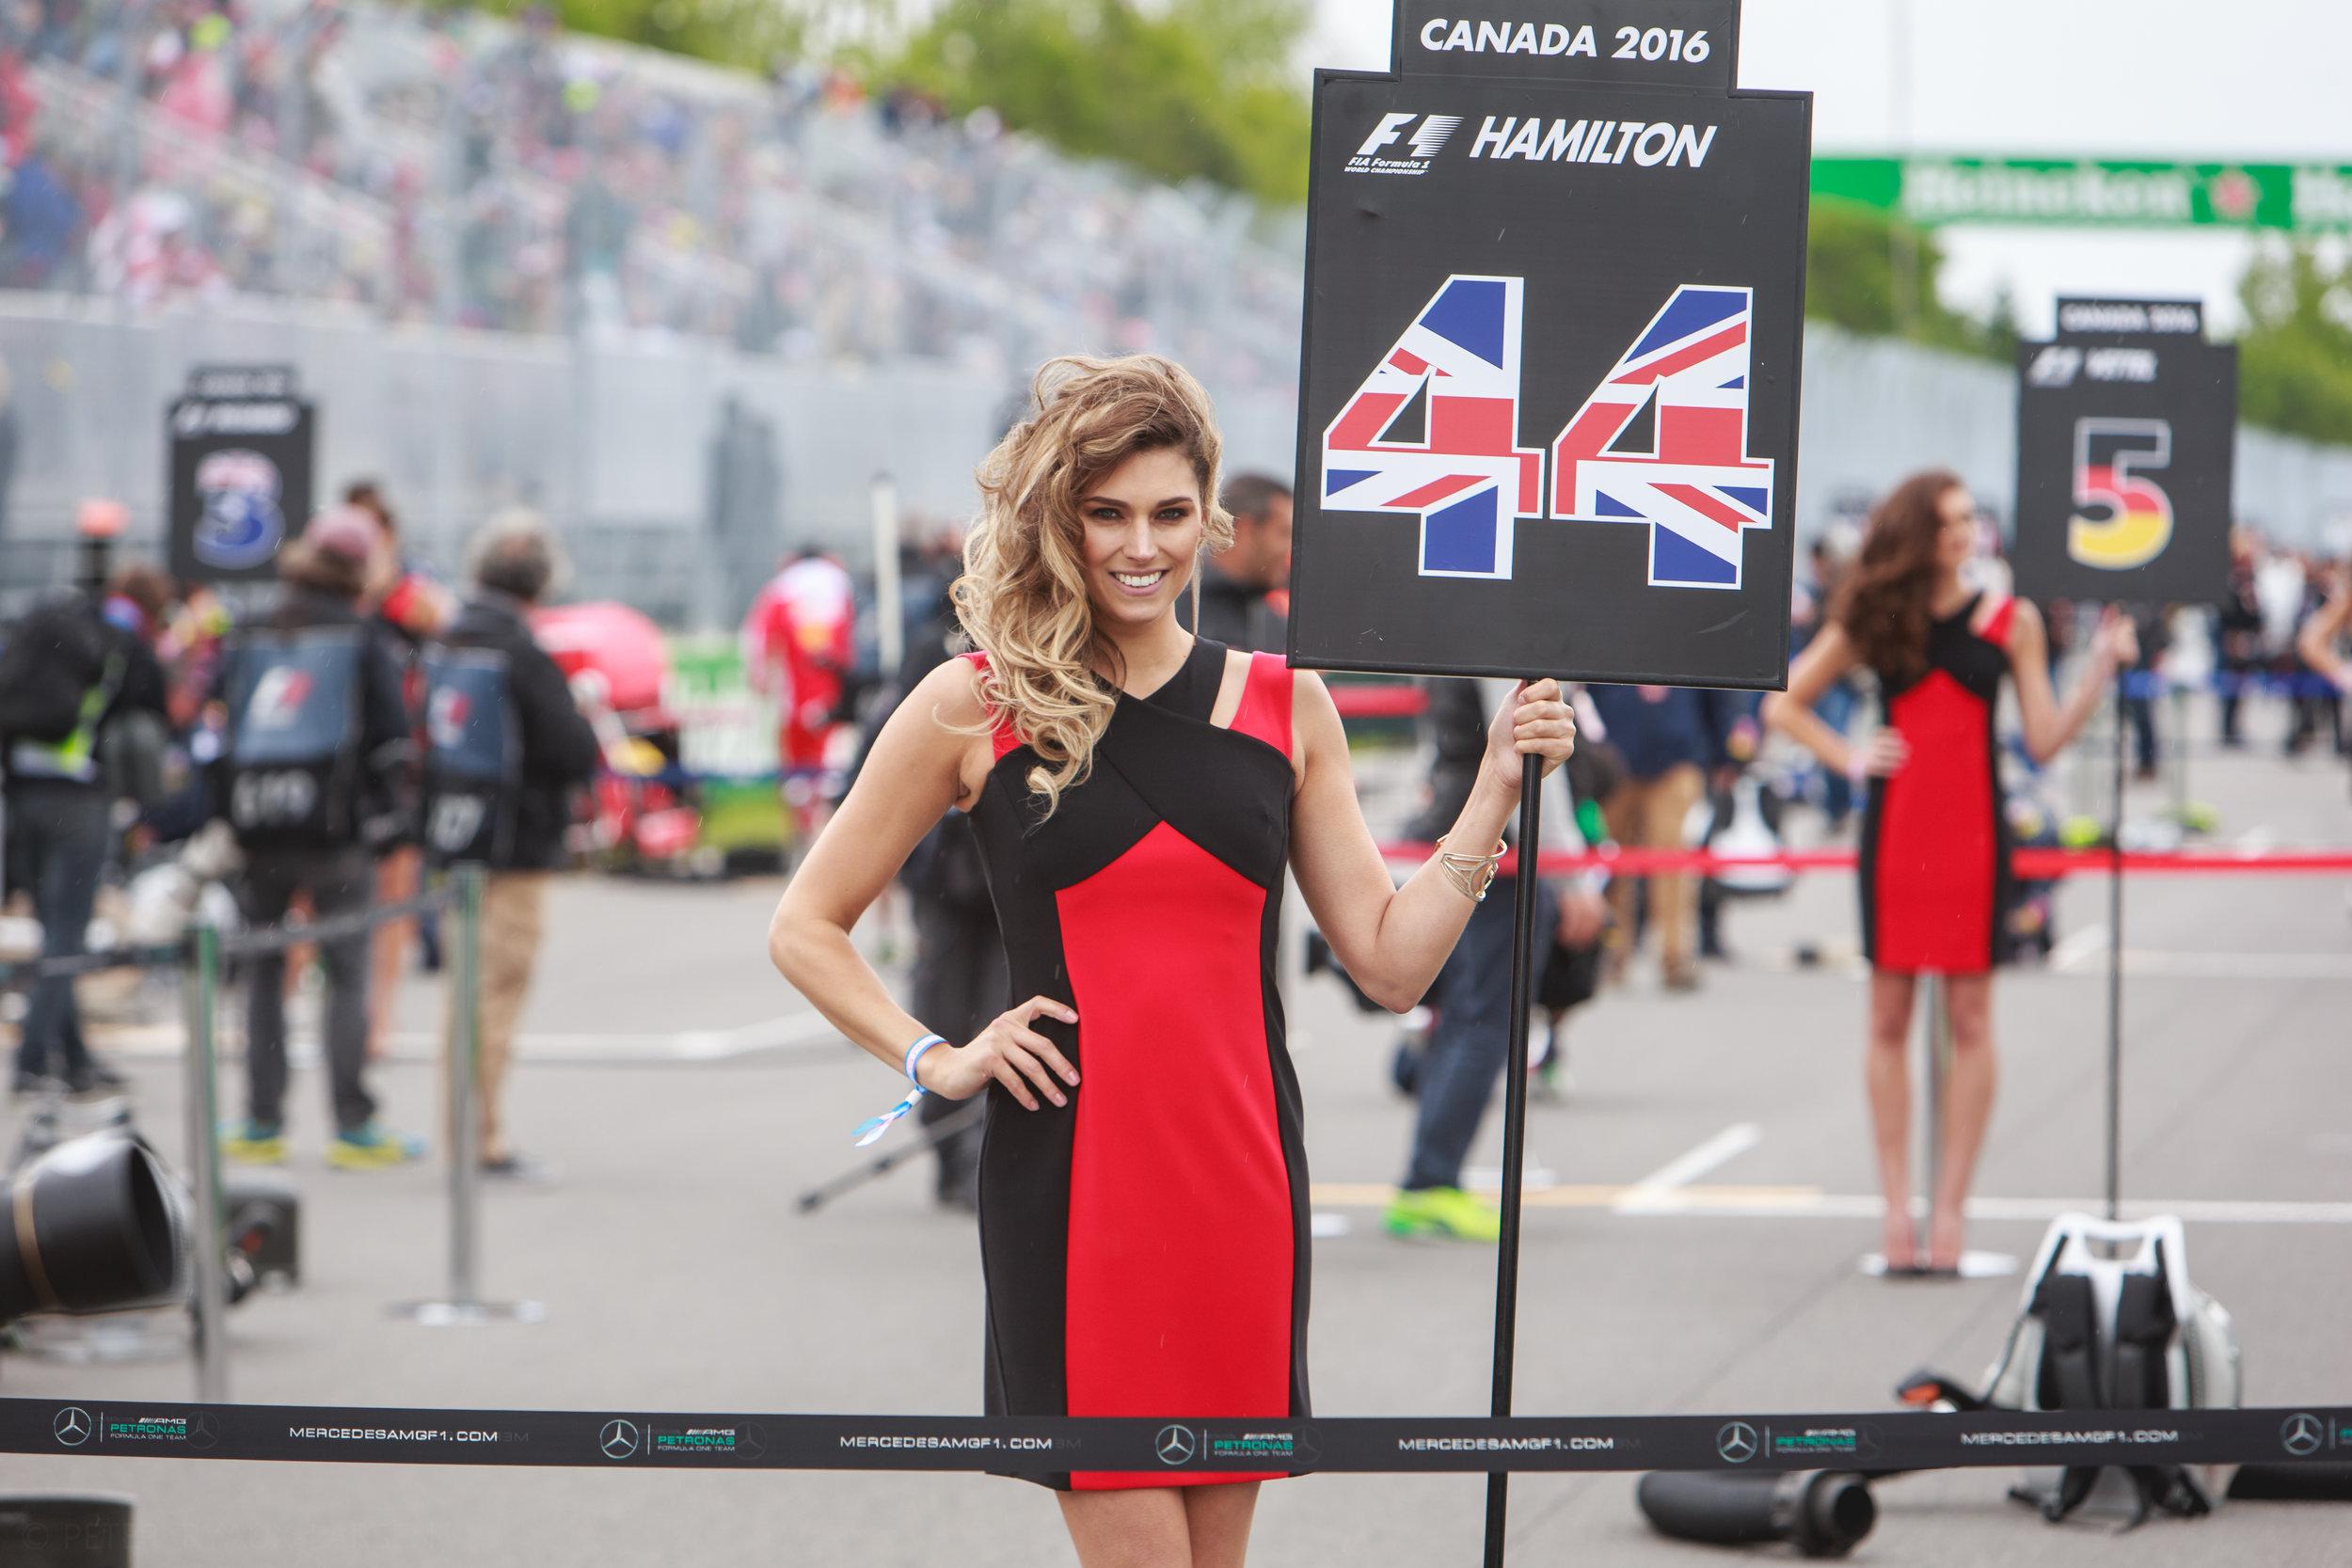 F1 Grand Prinx Canada - Sunday (quick export) - 037 - 20160612-0265.jpg